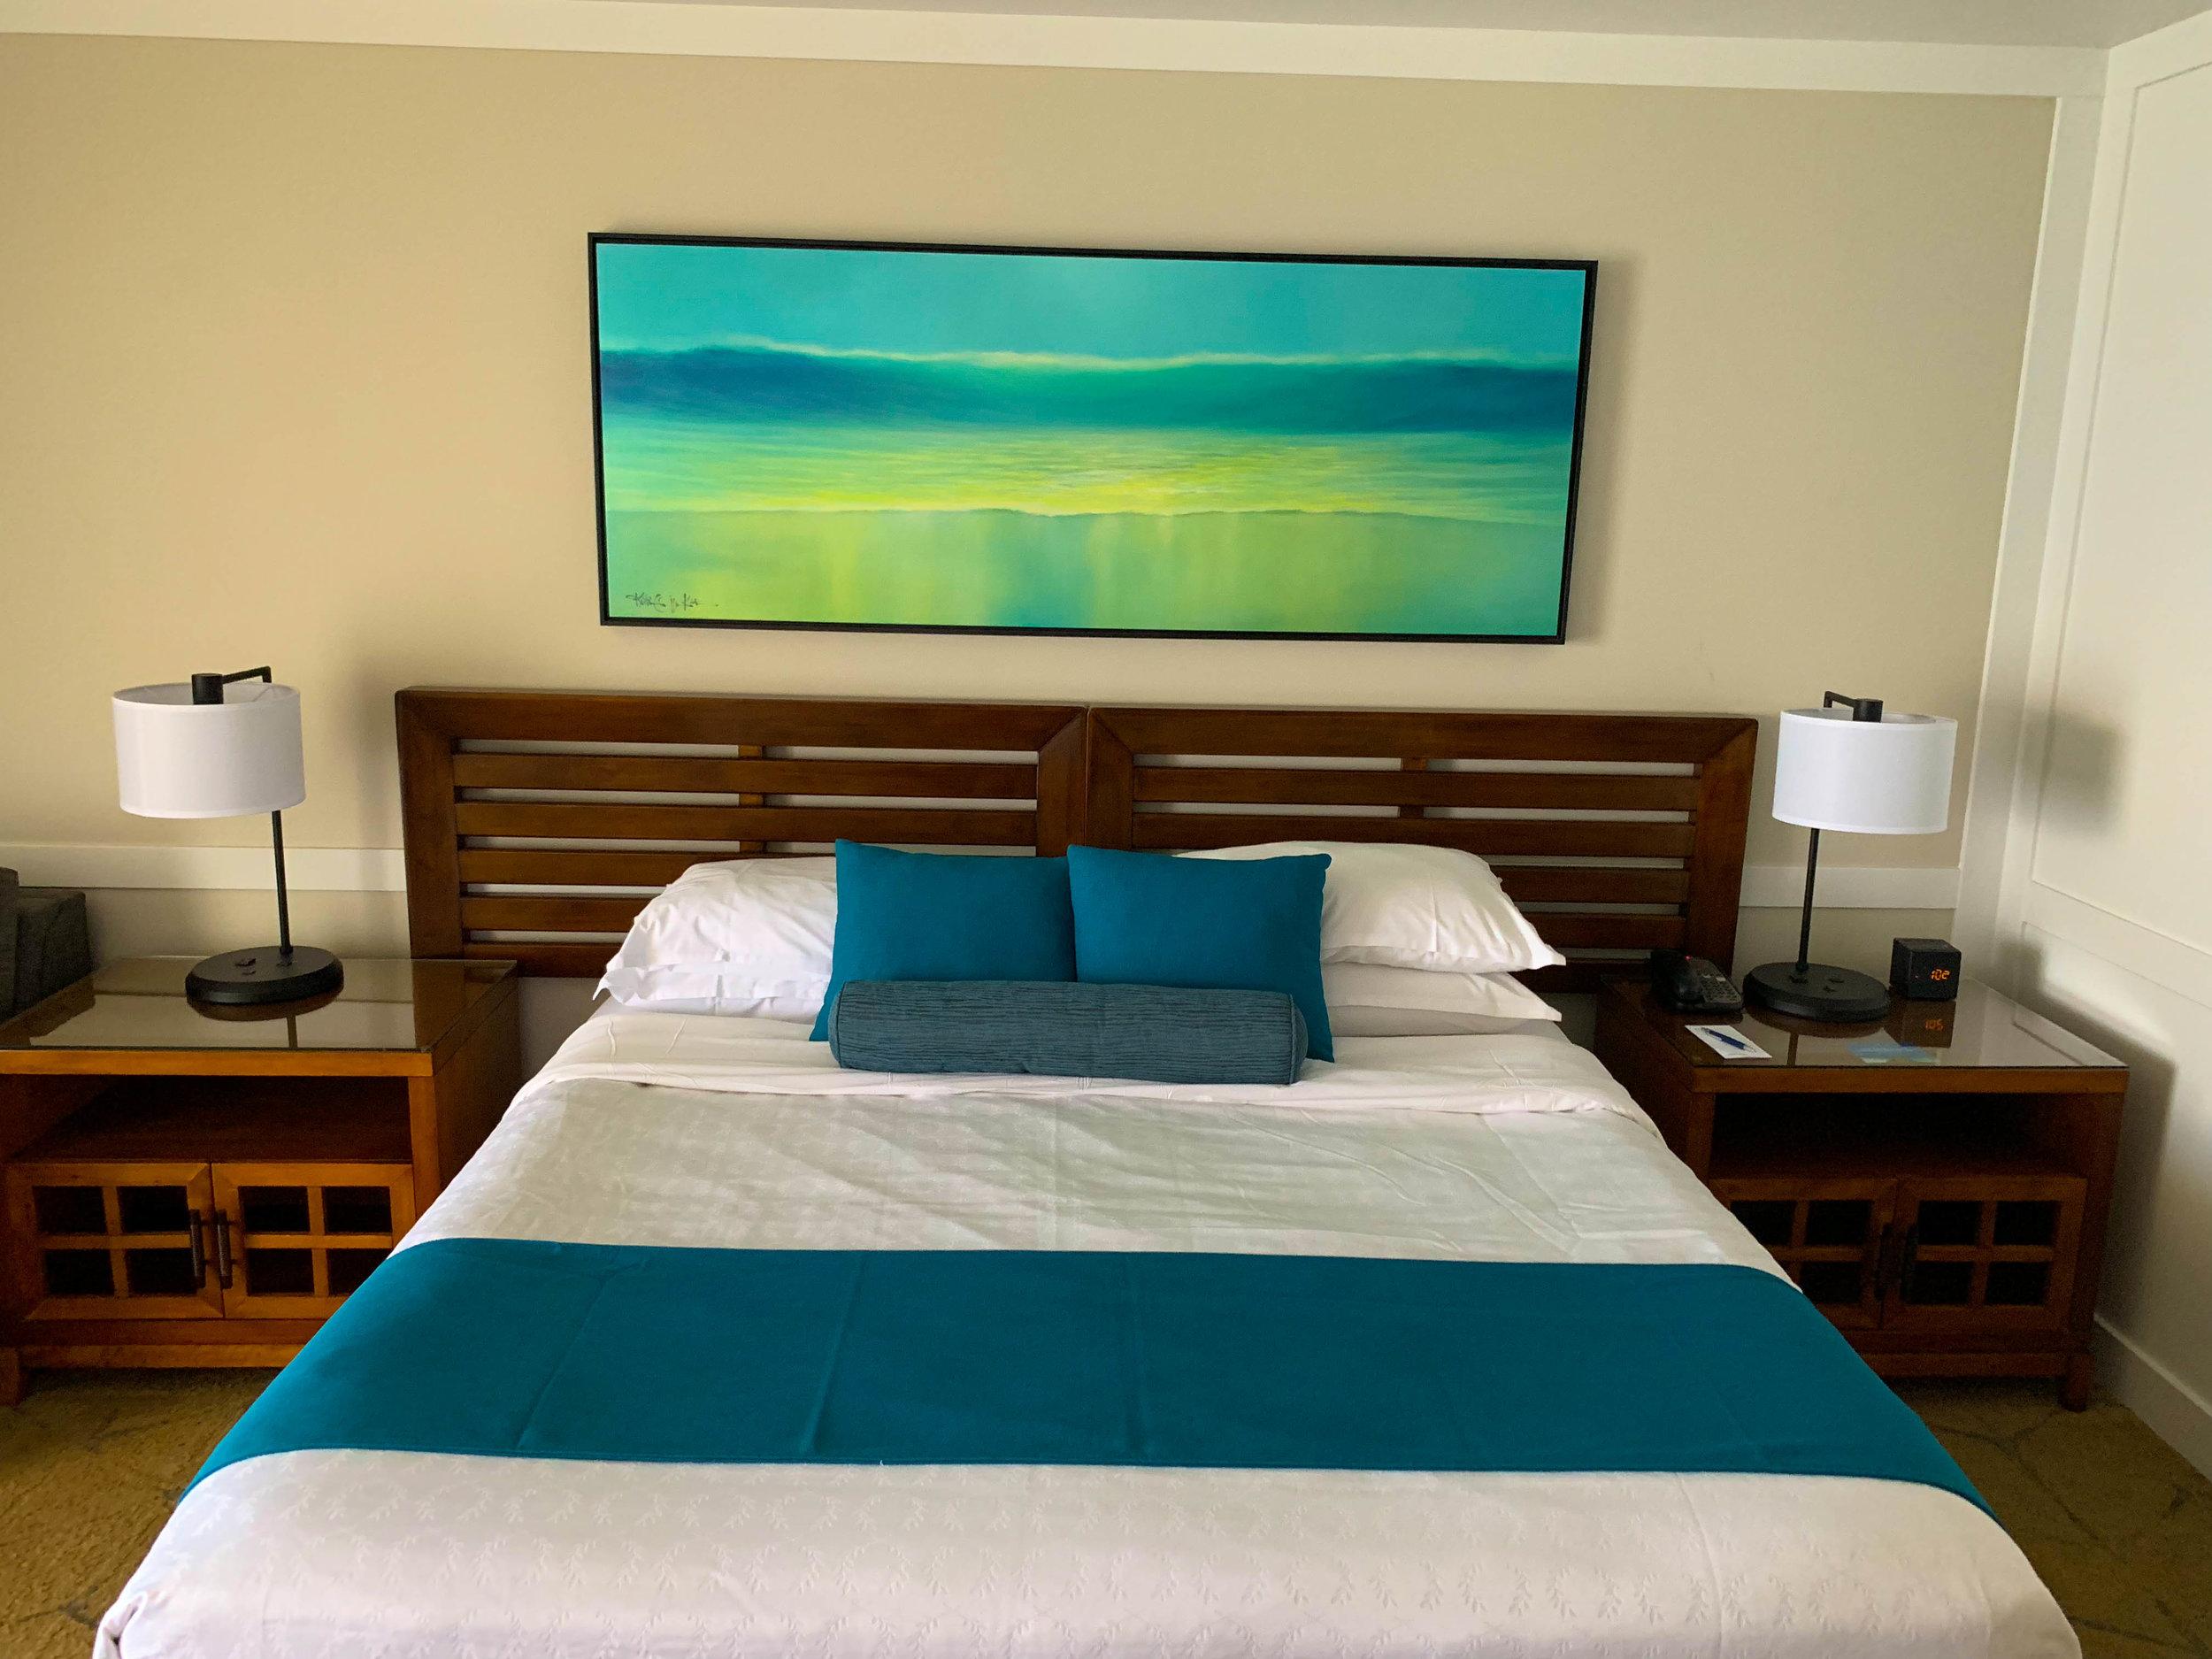 Sheraton Maui Resort Deluxe Ocean Front Room Bed